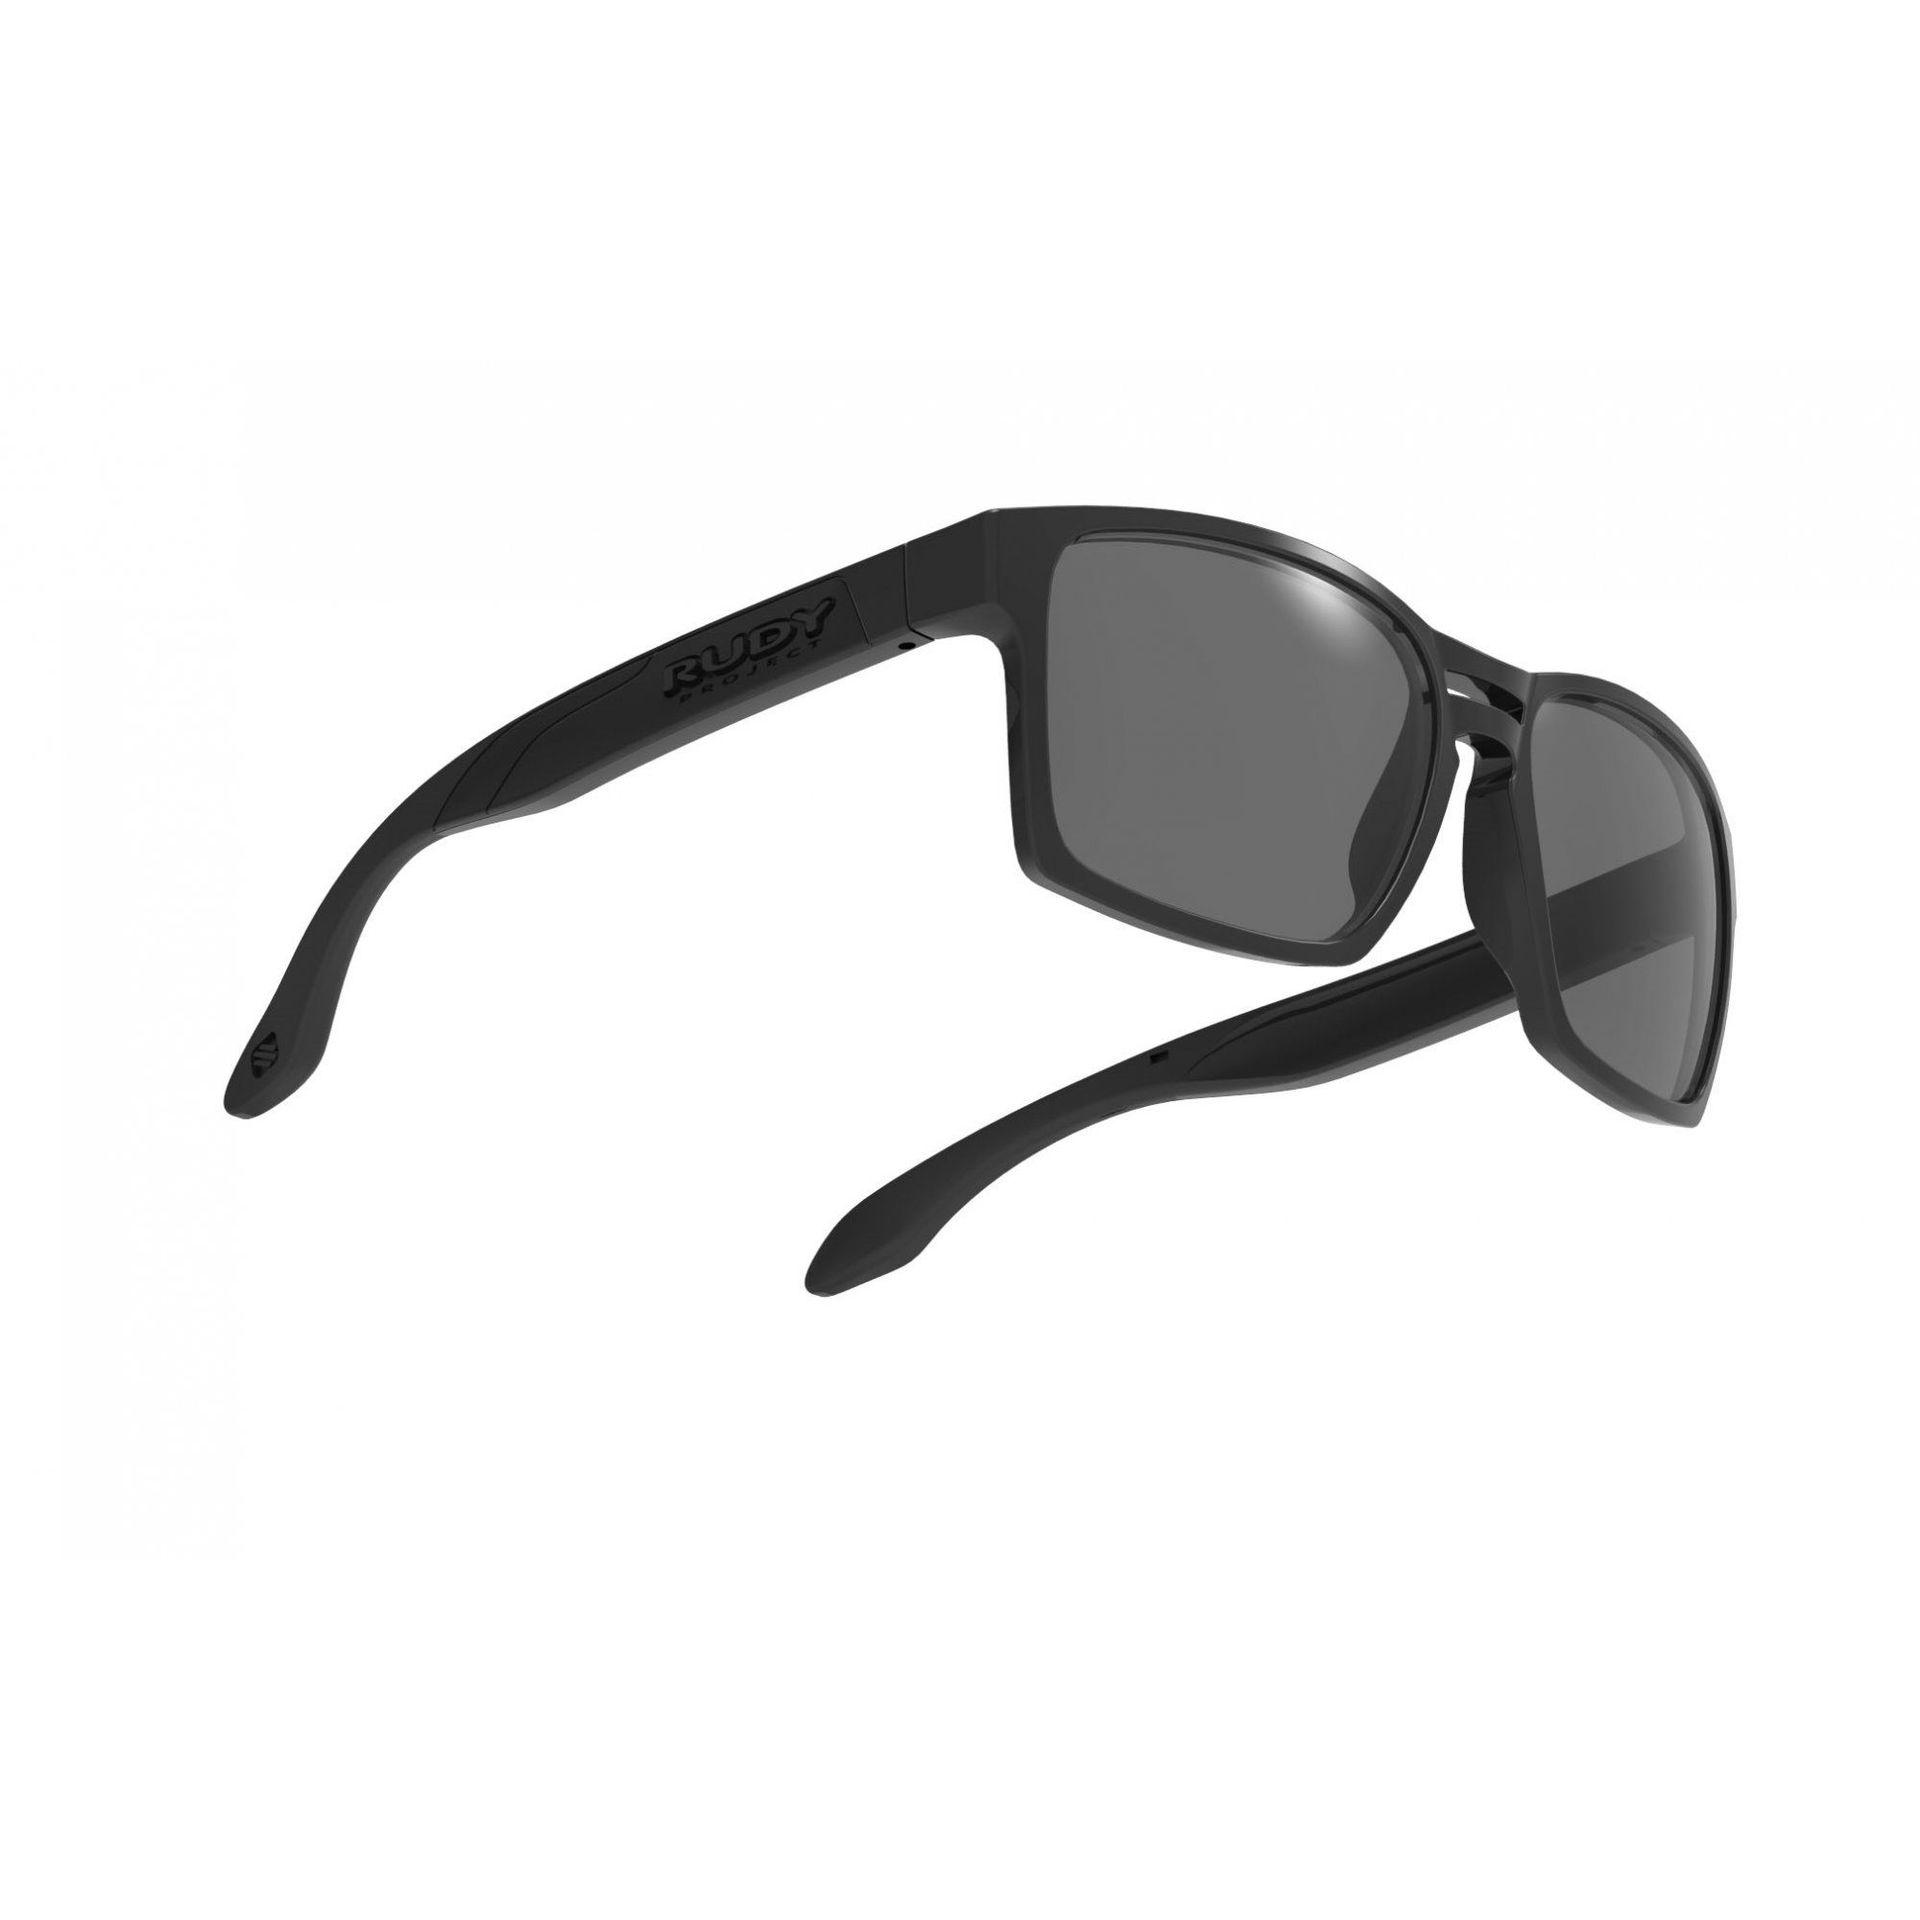 OKULARY RUDY PROJECT SPINAIR 57 BLACK + SMOKE BLACK SP571042 3